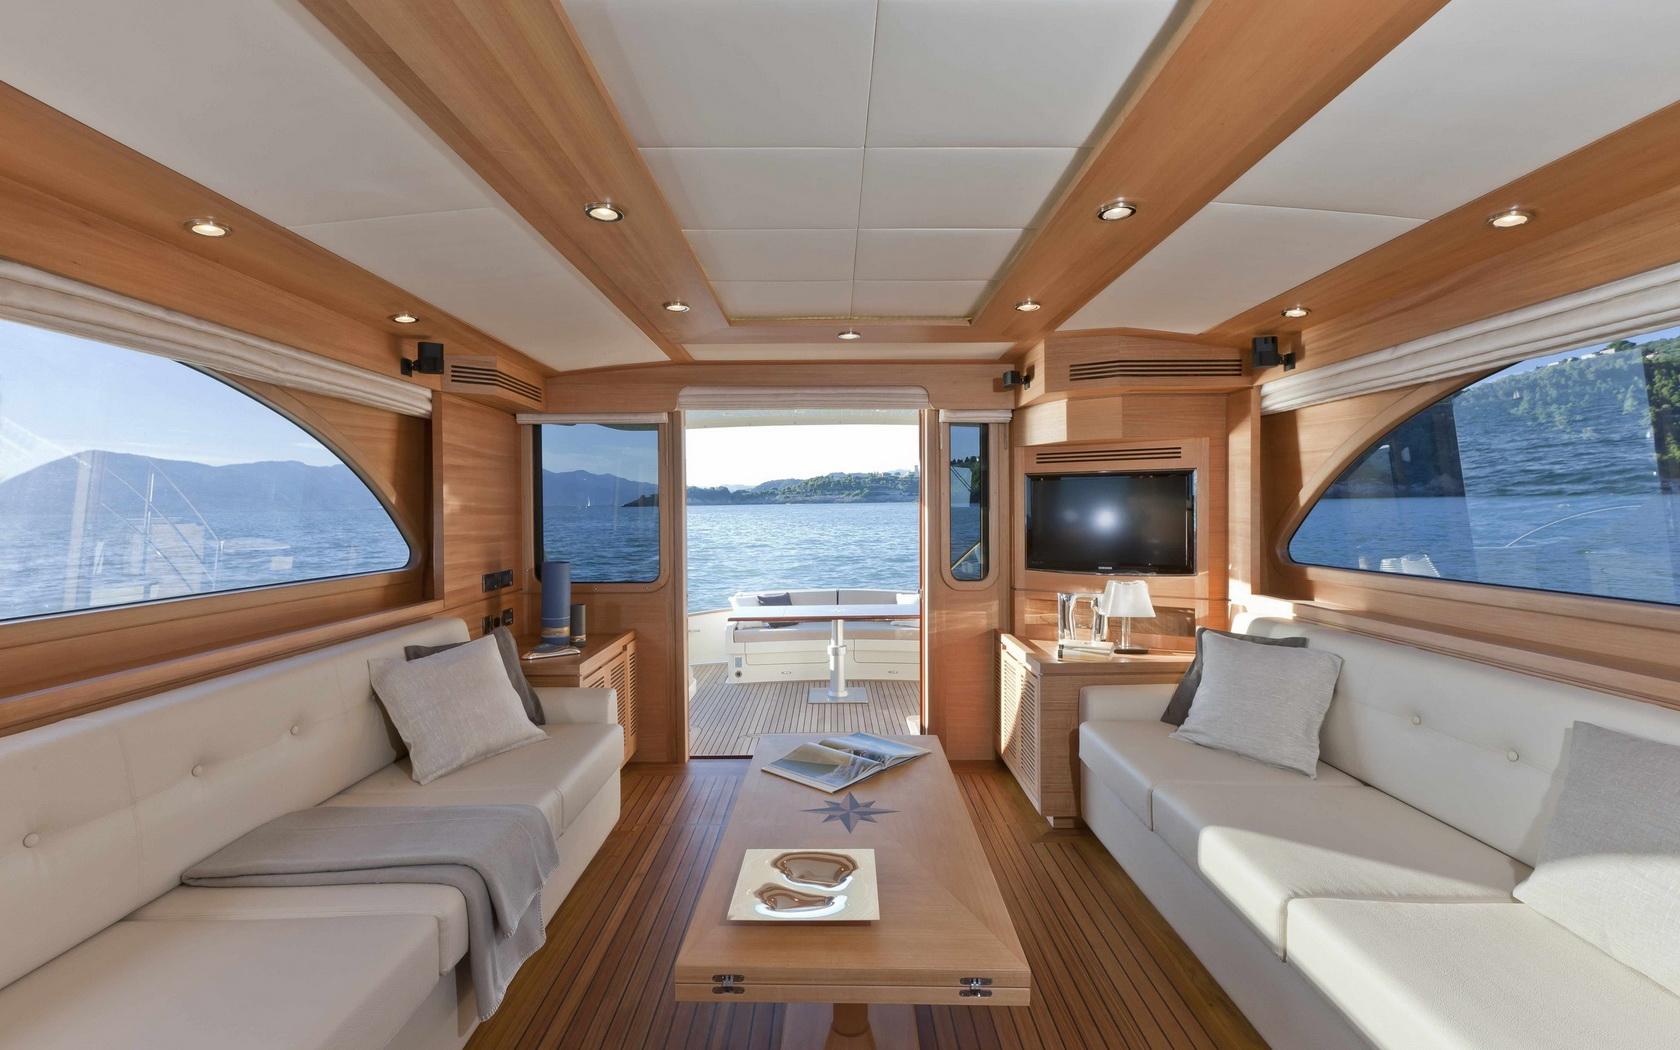 interior boat wallpaper 1680x1050 159559 wallpaperup. Black Bedroom Furniture Sets. Home Design Ideas